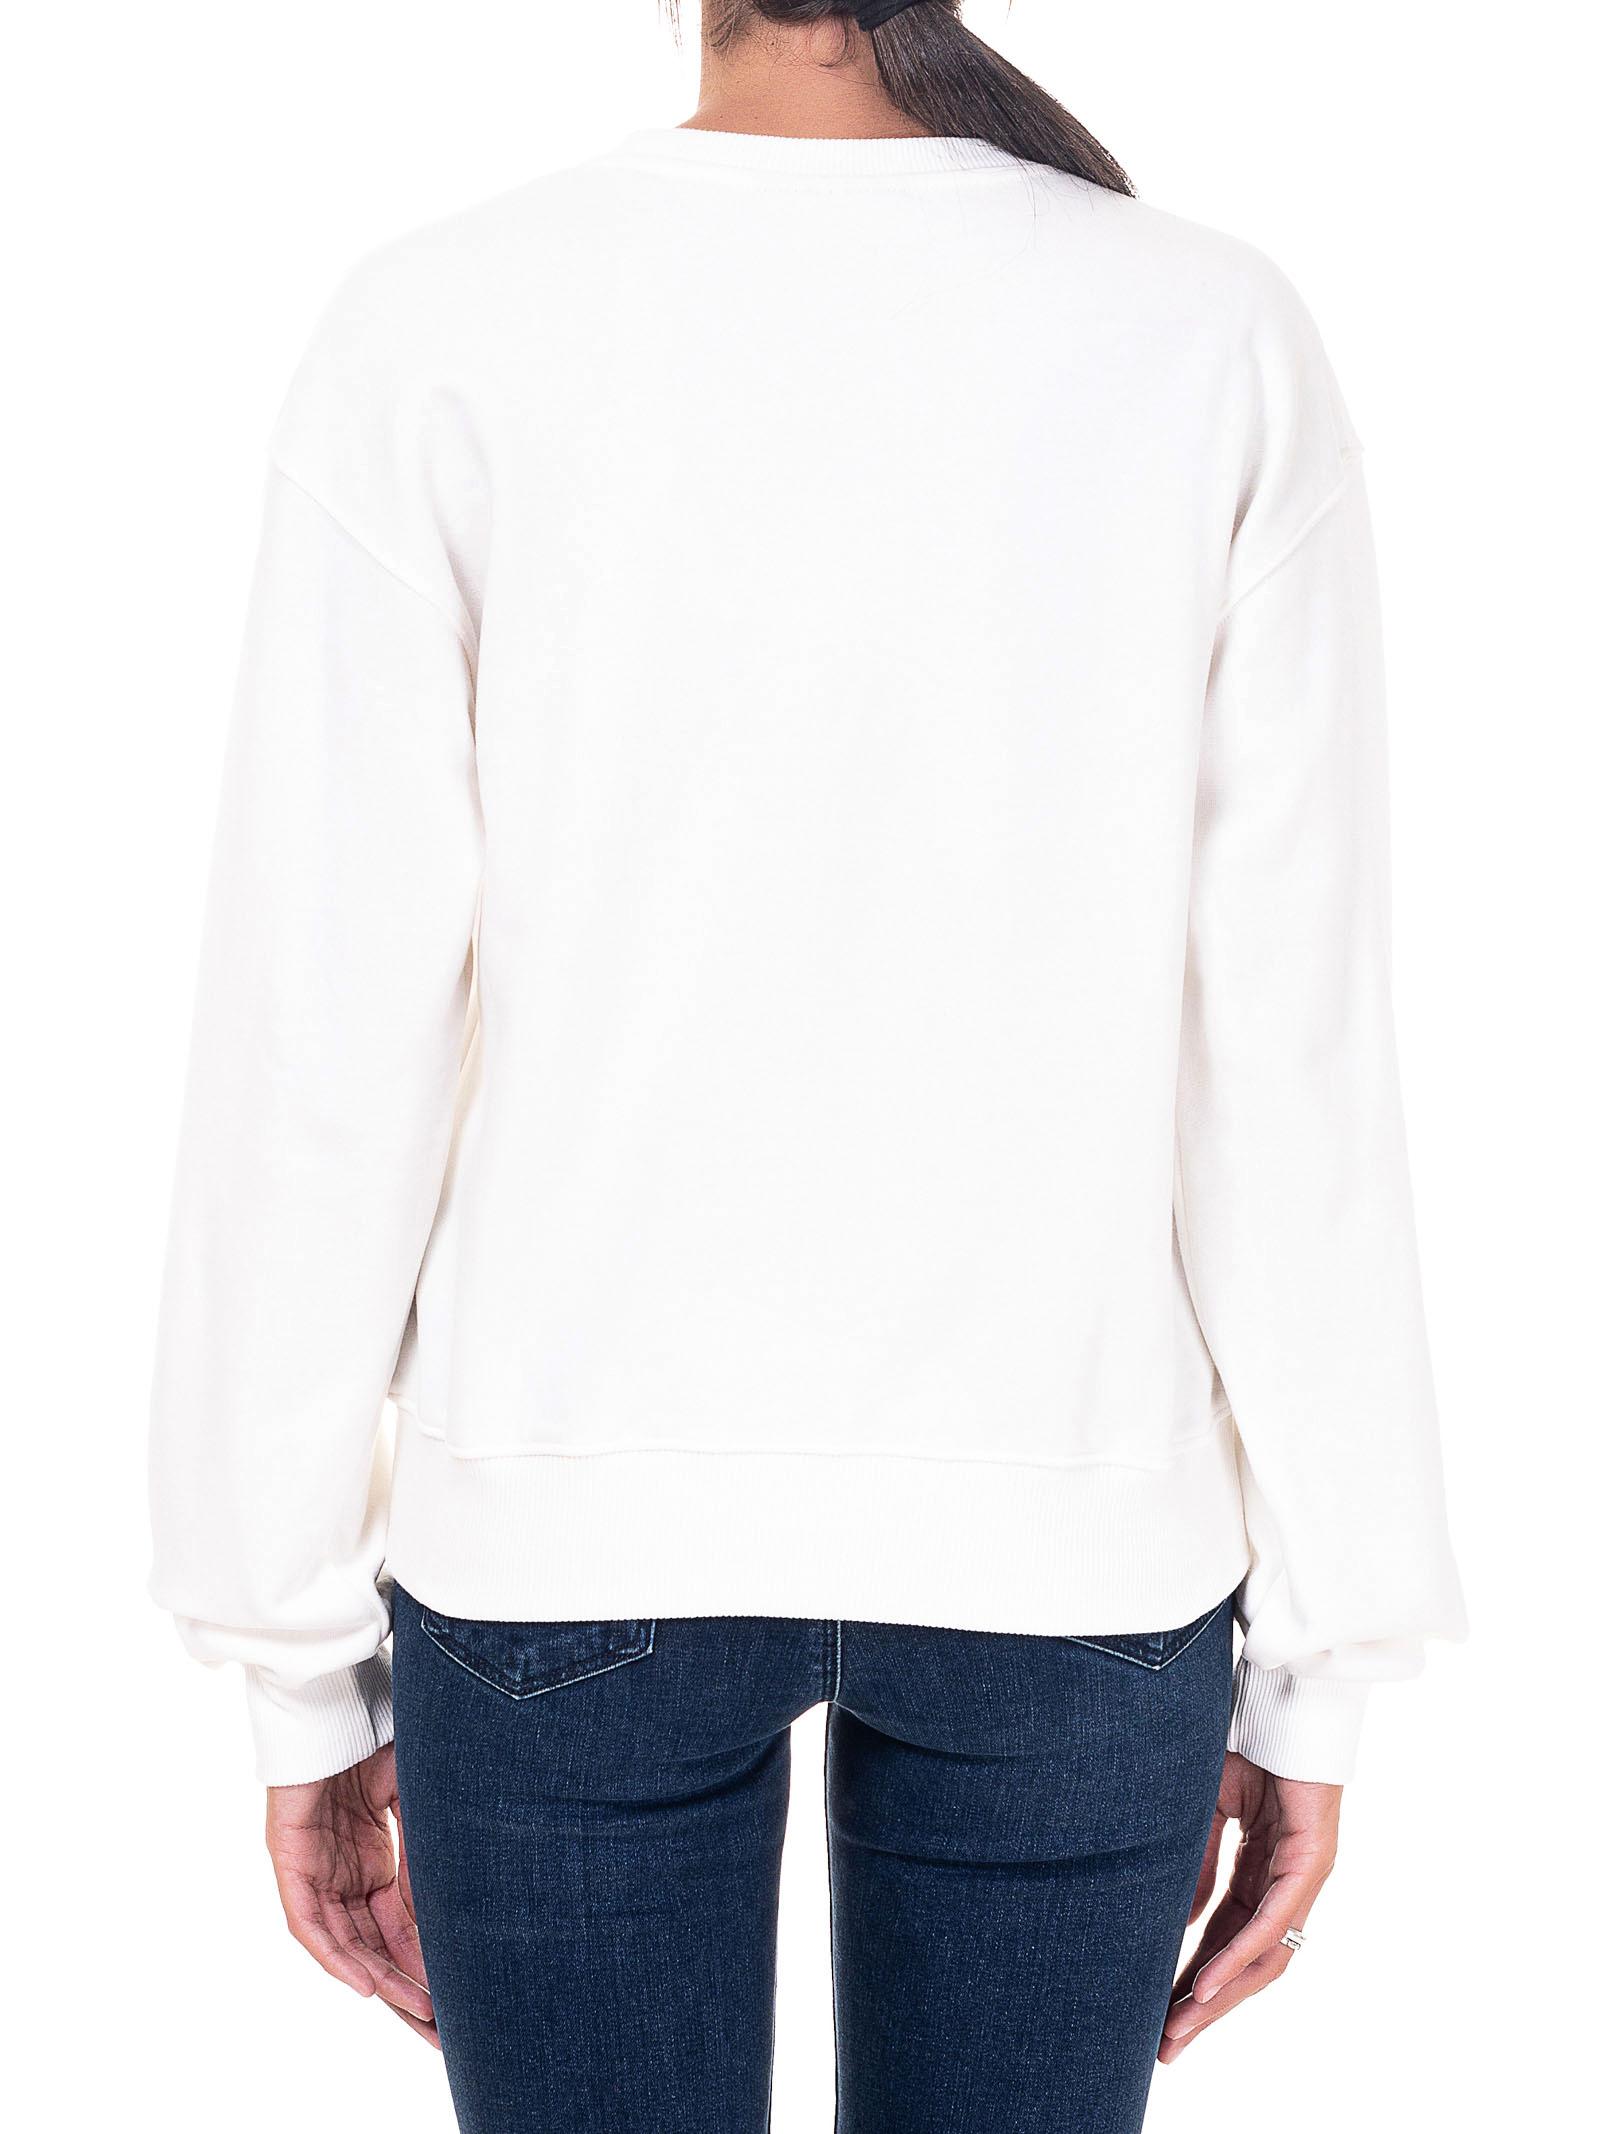 WHITE SWEATSHIRT IN COTTON FLIRTING MODEL CHIARA FERRAGNI | Sweatshirts | CFF082BIANCO